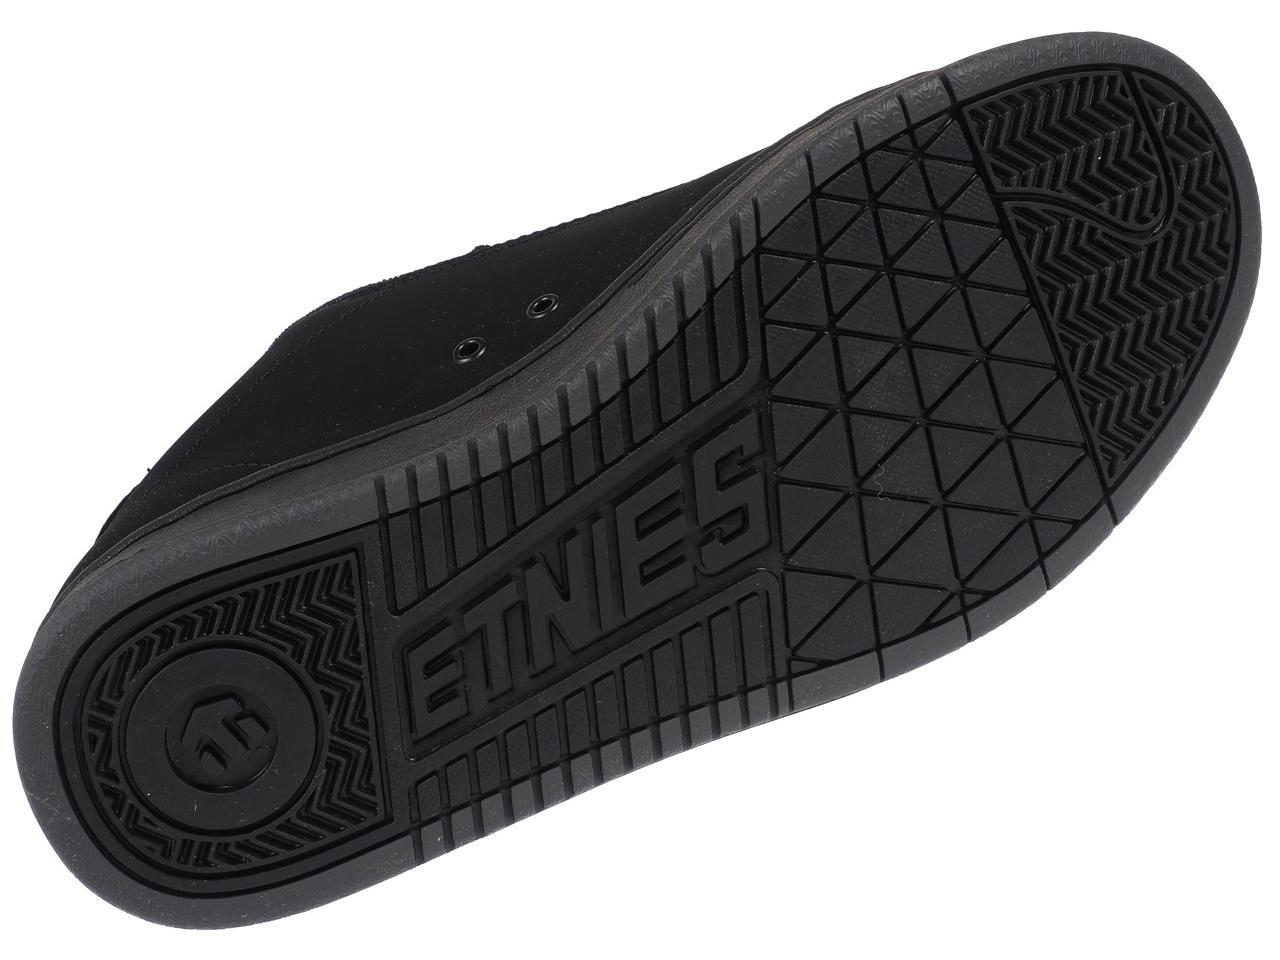 Shoes-Skateboard-Etnies-Fader-Black-Dirty-Wash-Black-42823-New thumbnail 4